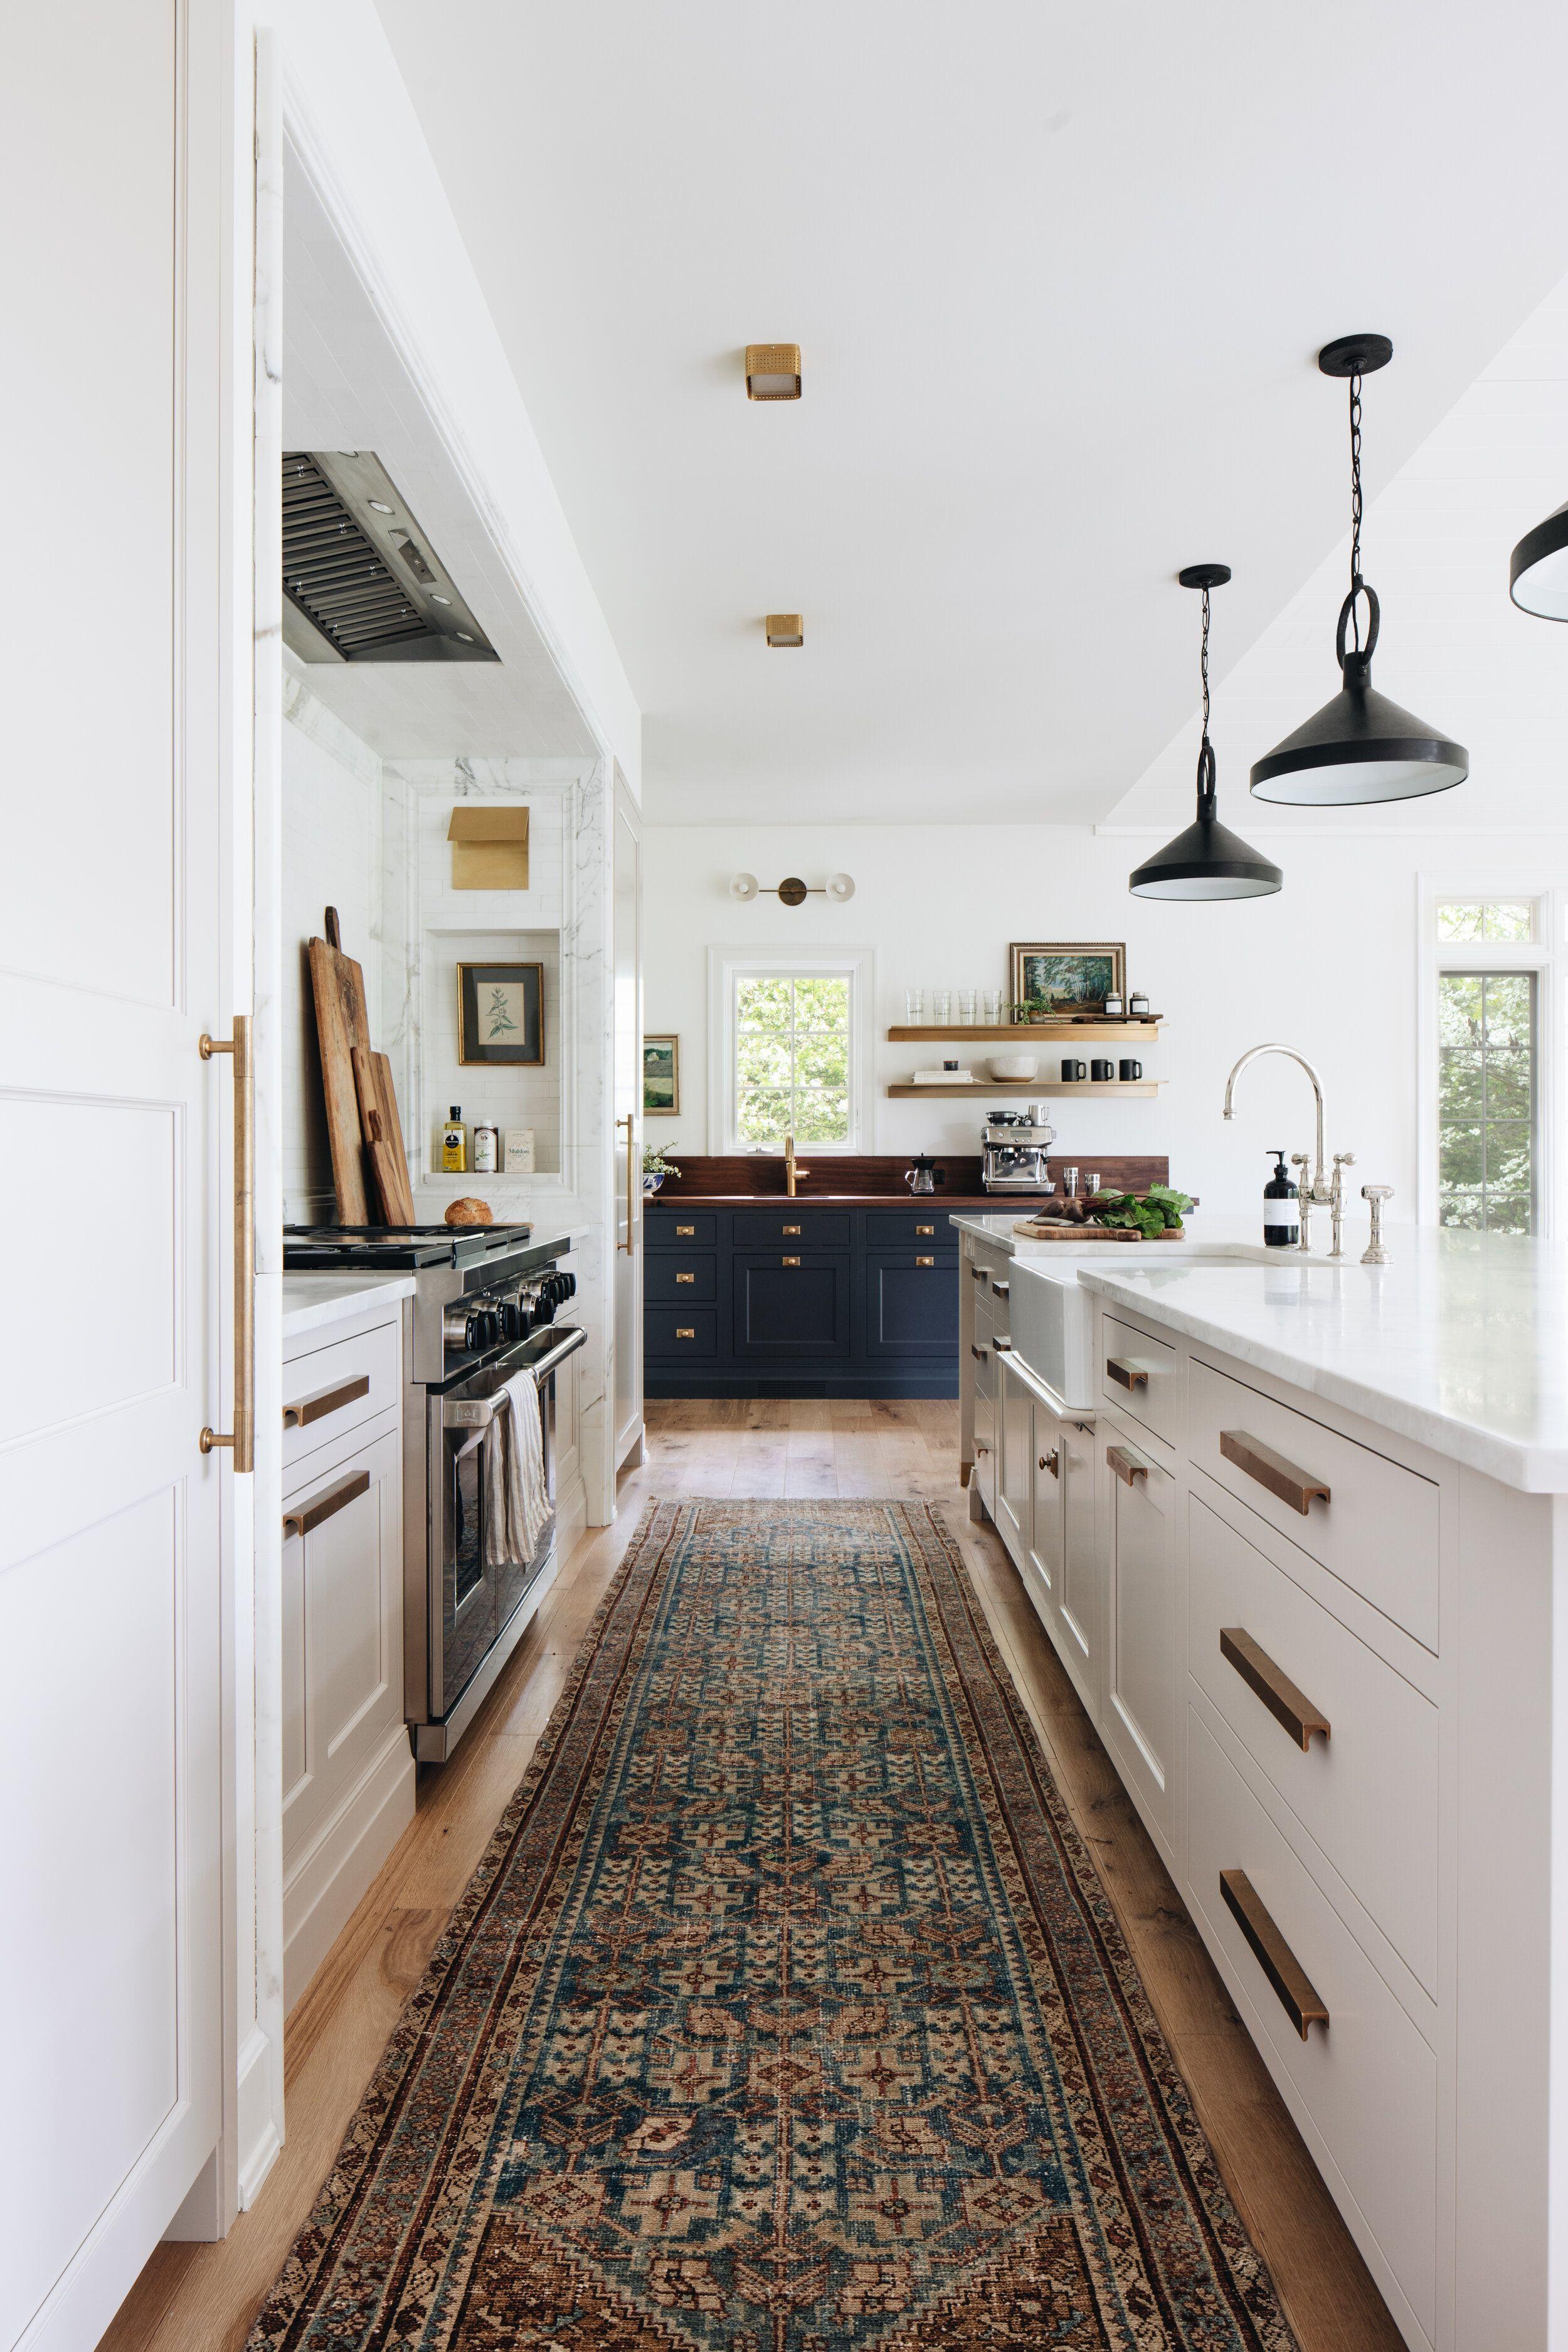 White Kitchen Cabinetry Modern Kitchen Traditional Rug Runner Gold Hardware Navy Cabinetry Jean In 2020 Kitchen Inspirations Gorgeous Kitchens Kitchen Decor